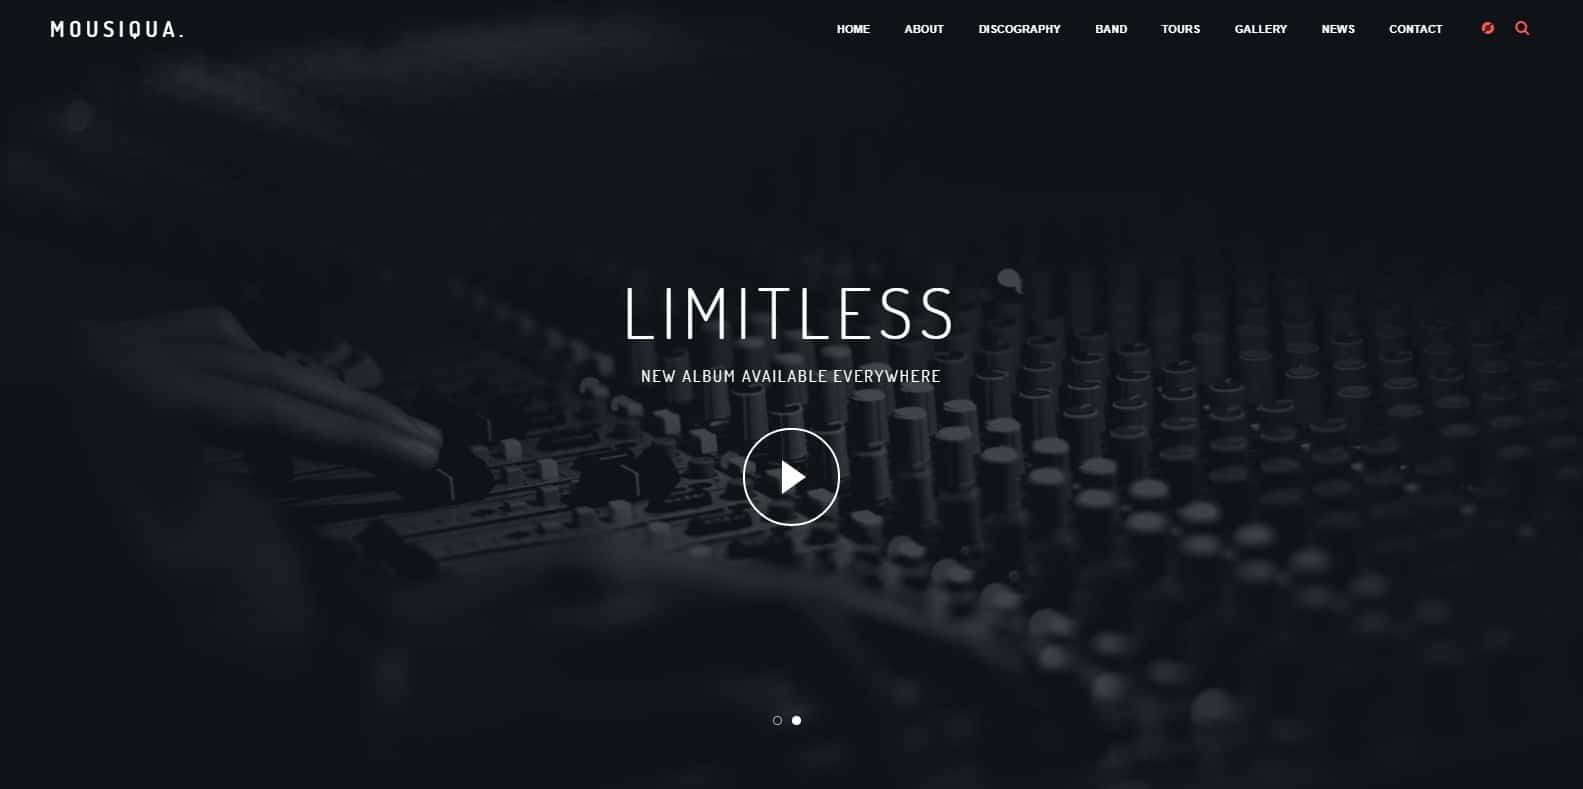 mousiqua-html-music-website-template